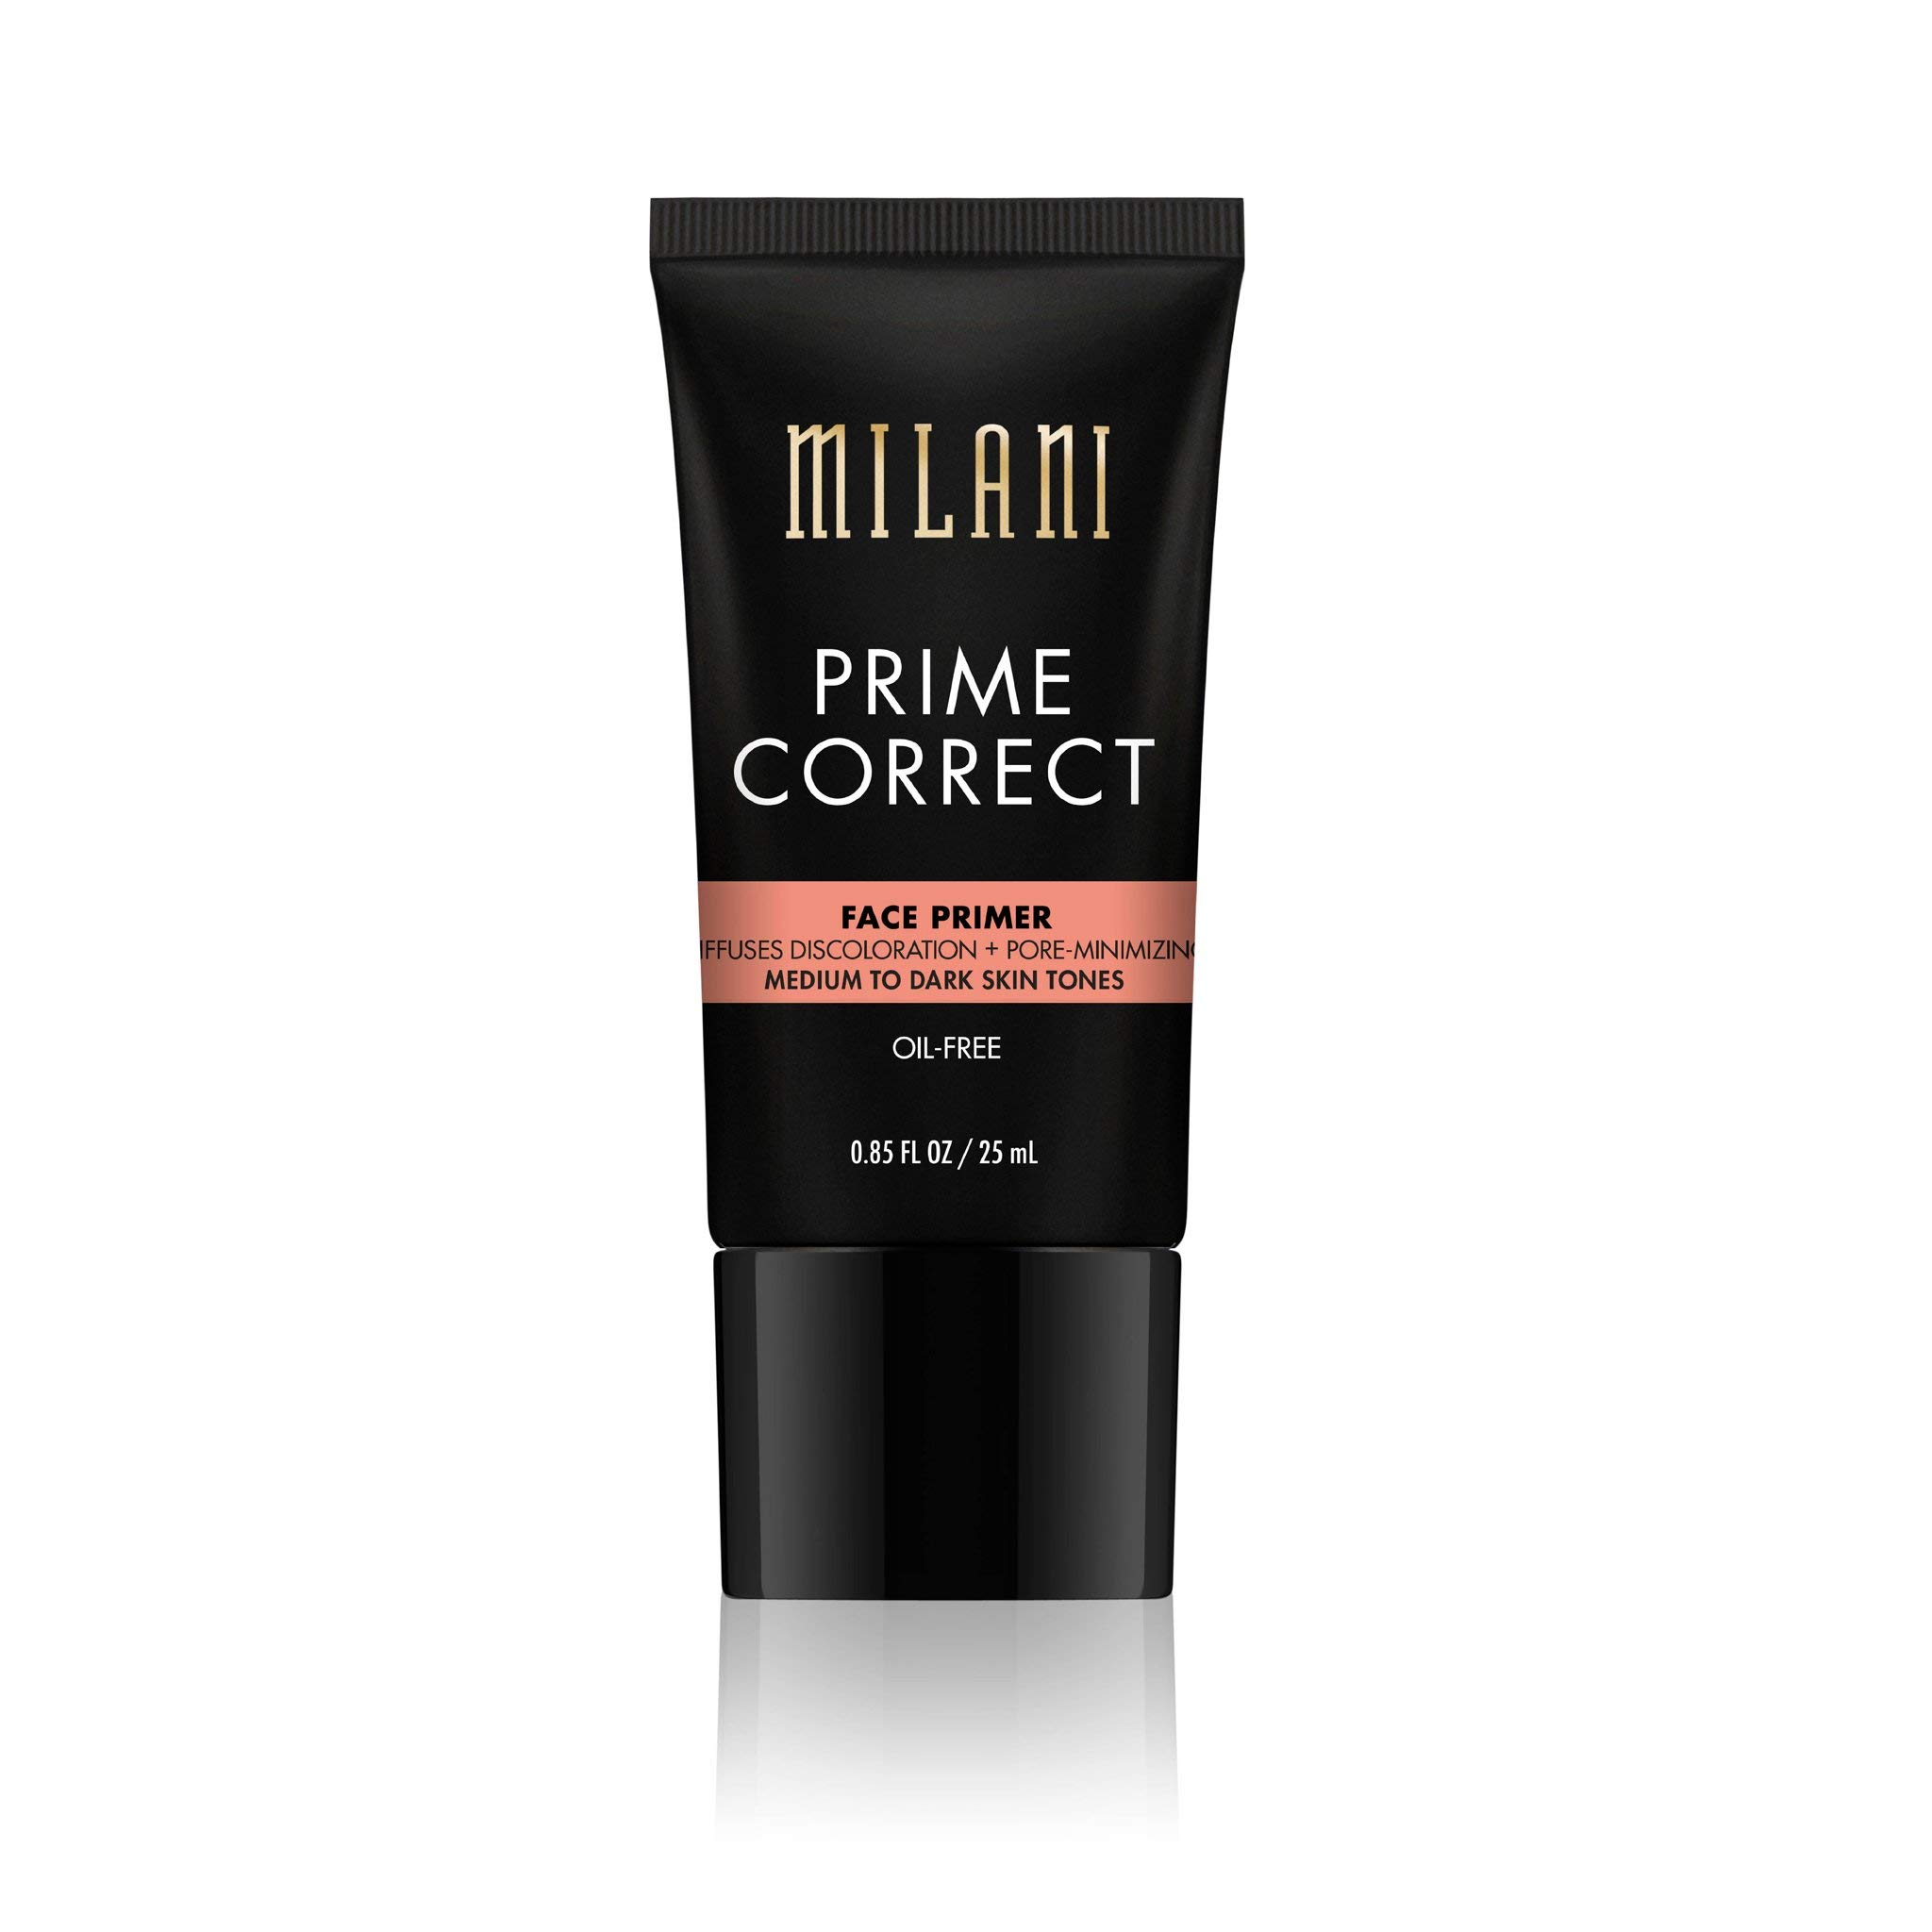 Milani Prime Correct Face Primer - Diffuses Discoloration + Pore-Minimizing - Medium/Dark (0.85 Fl. Oz.) Vegan, Cruelty-Free Face Makeup Primer to Color Correct Skin & Reduce Appearance of Pores